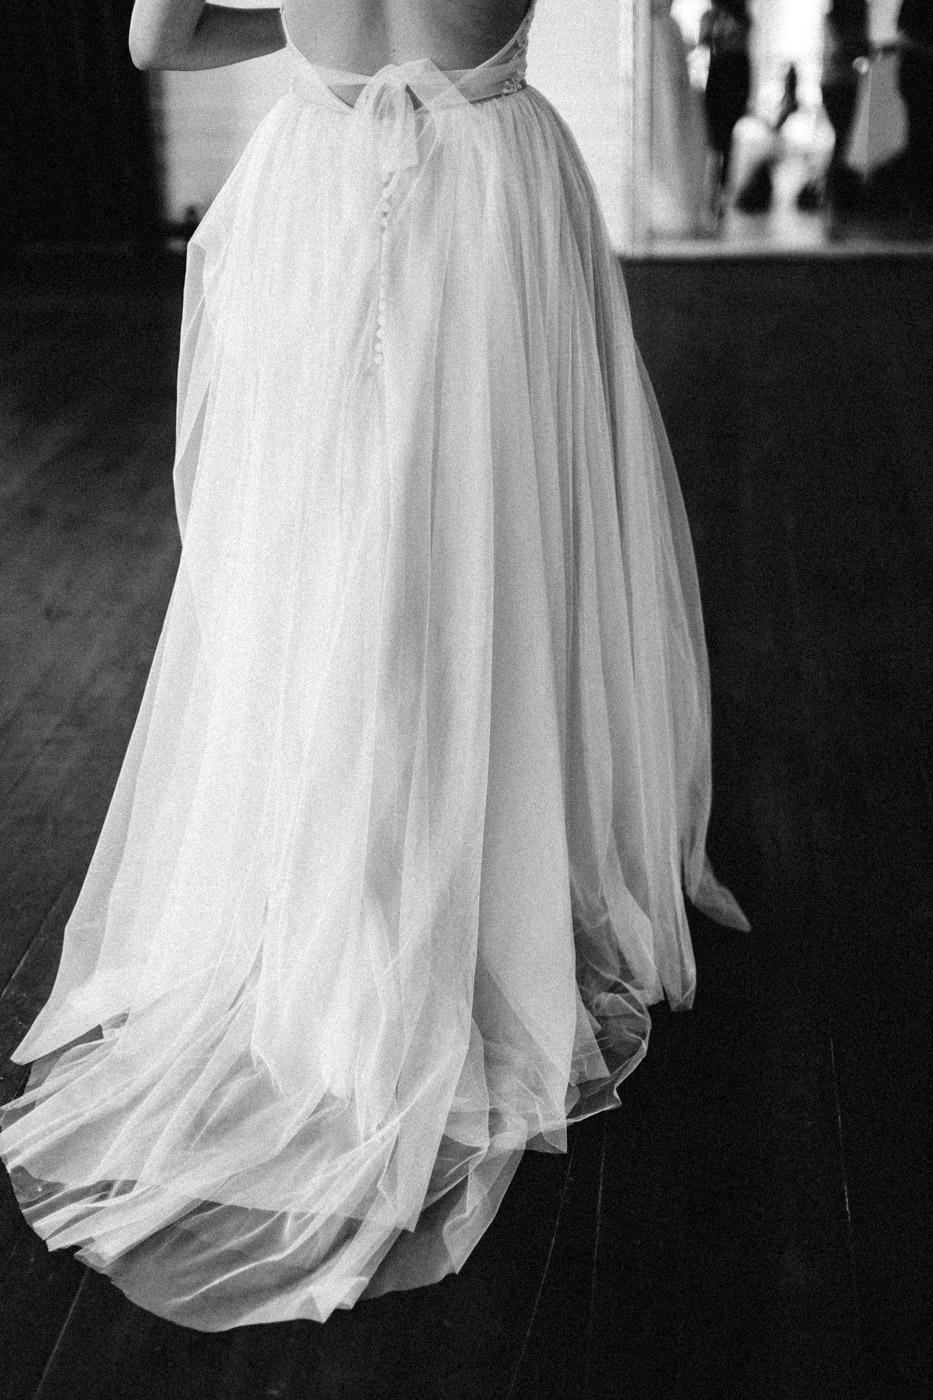 the_great_hall_wedding_photos 2017-265.jpg